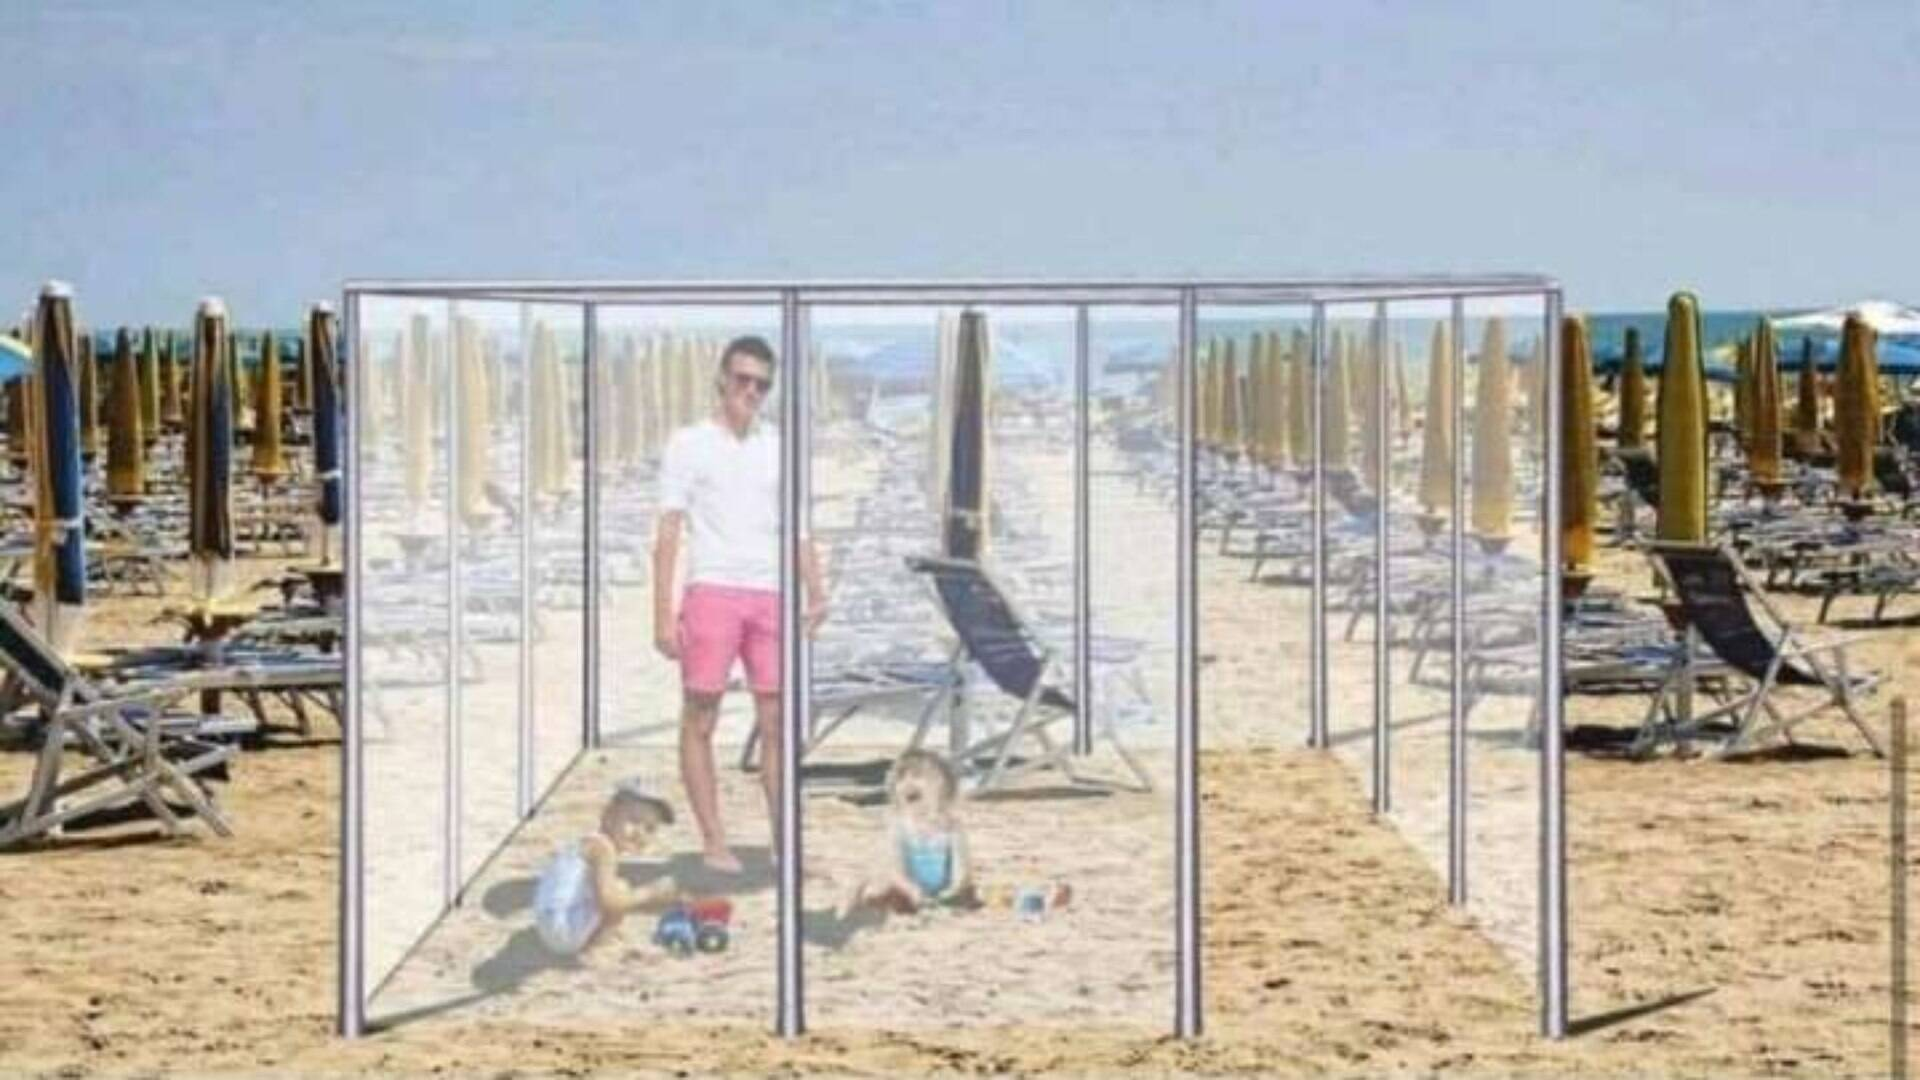 Europa tem projetos 'inovadores' para as praias pós-pandemia - Turismo - iG